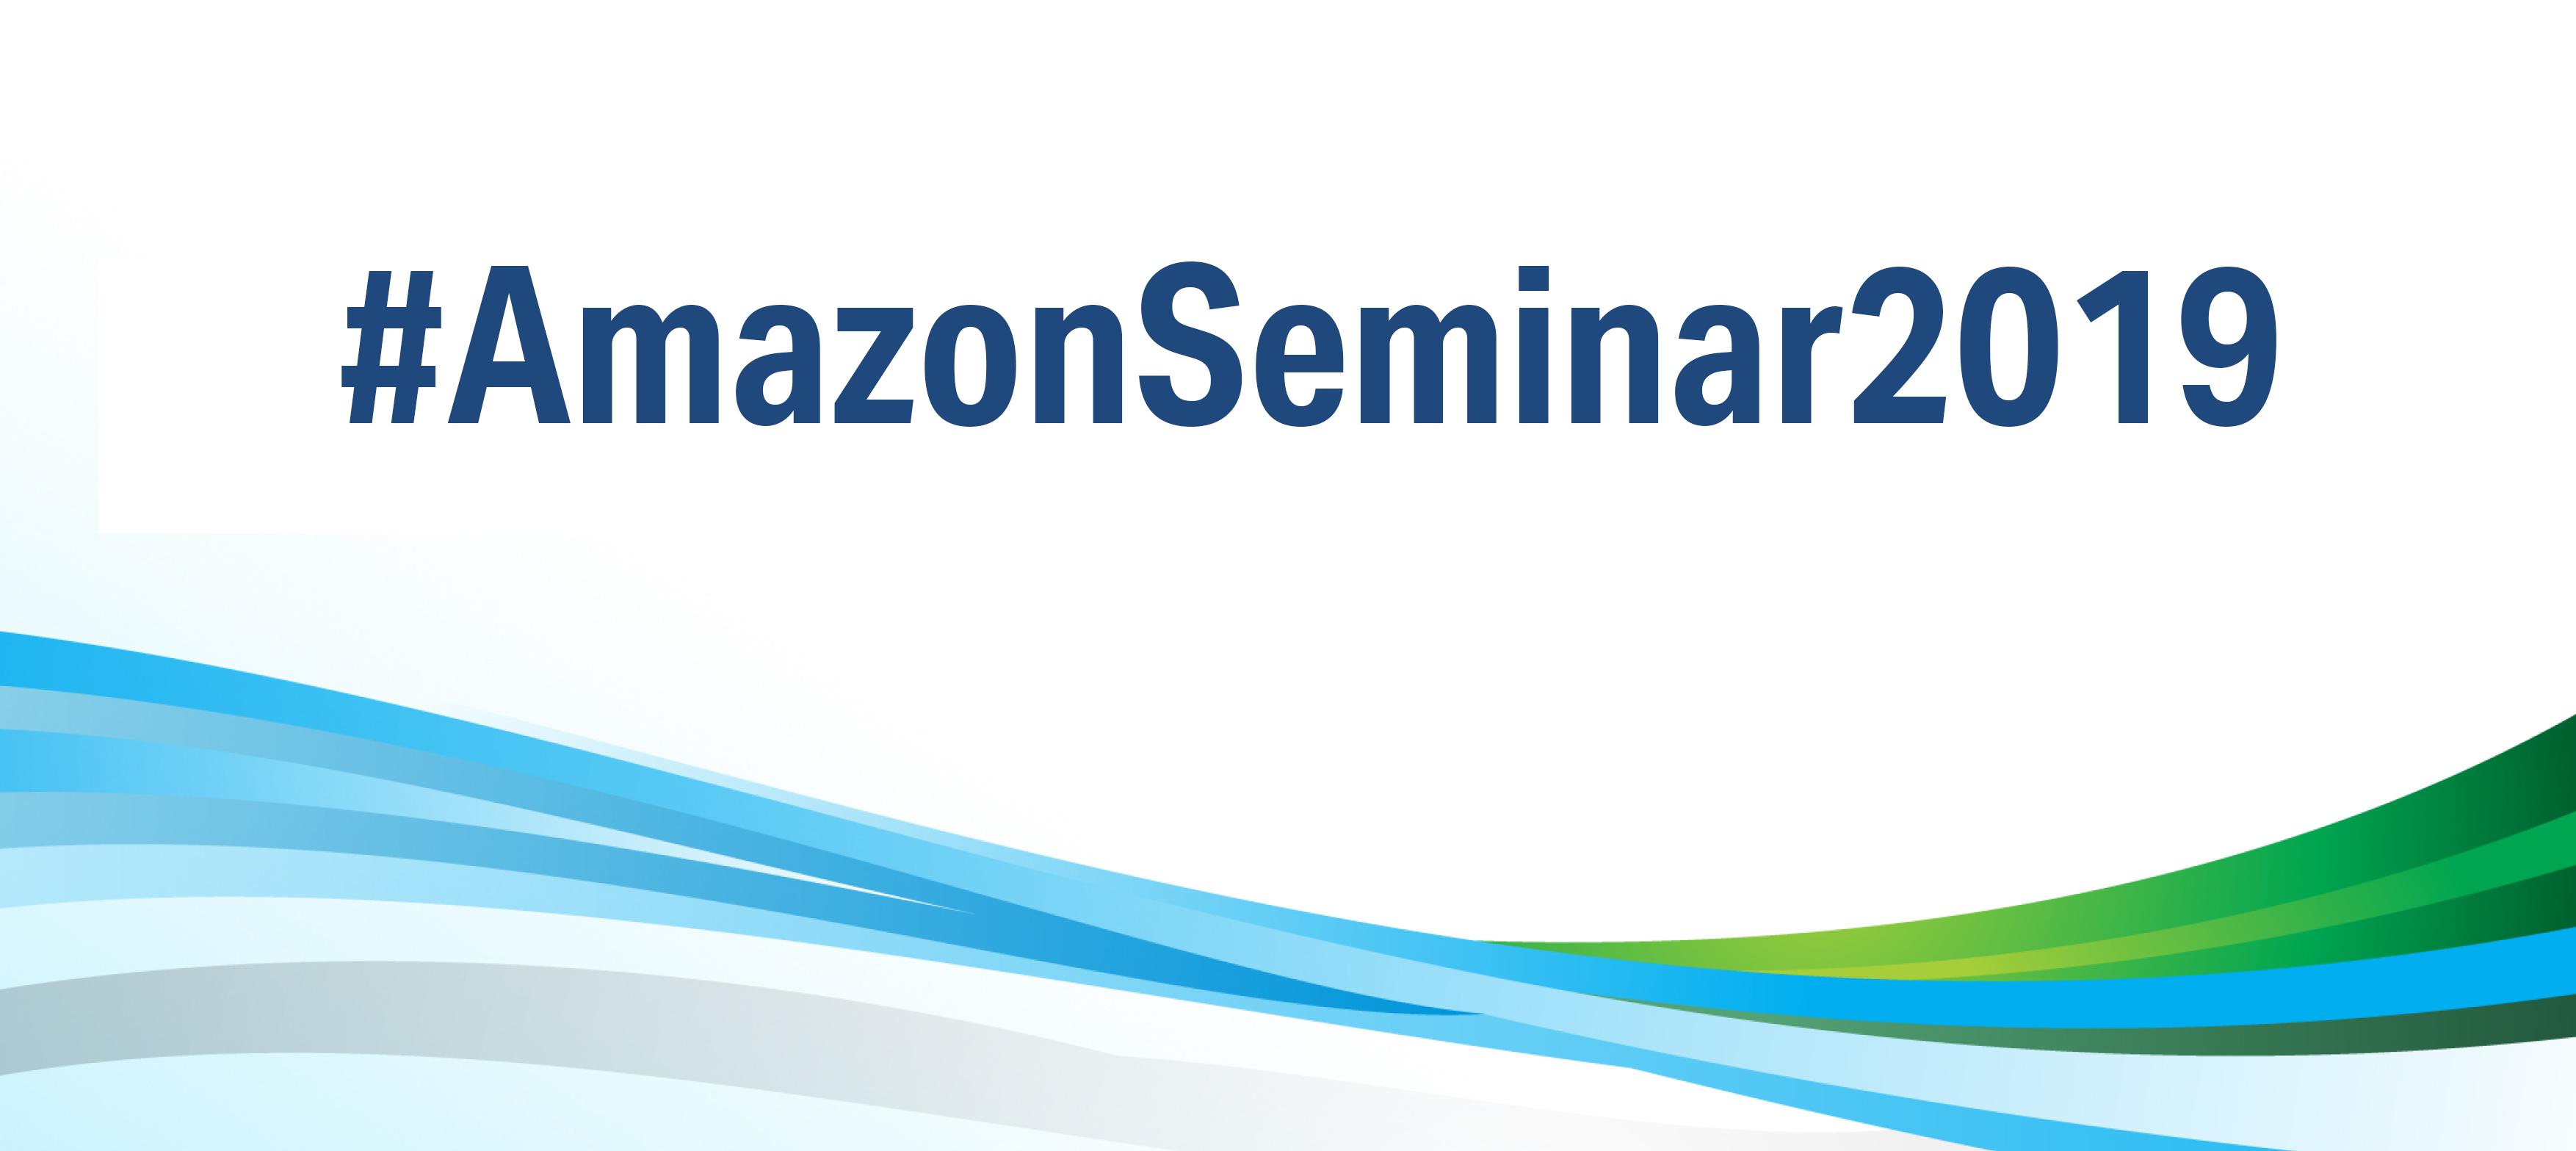 Hashtag-Amazon-Seminar-2019